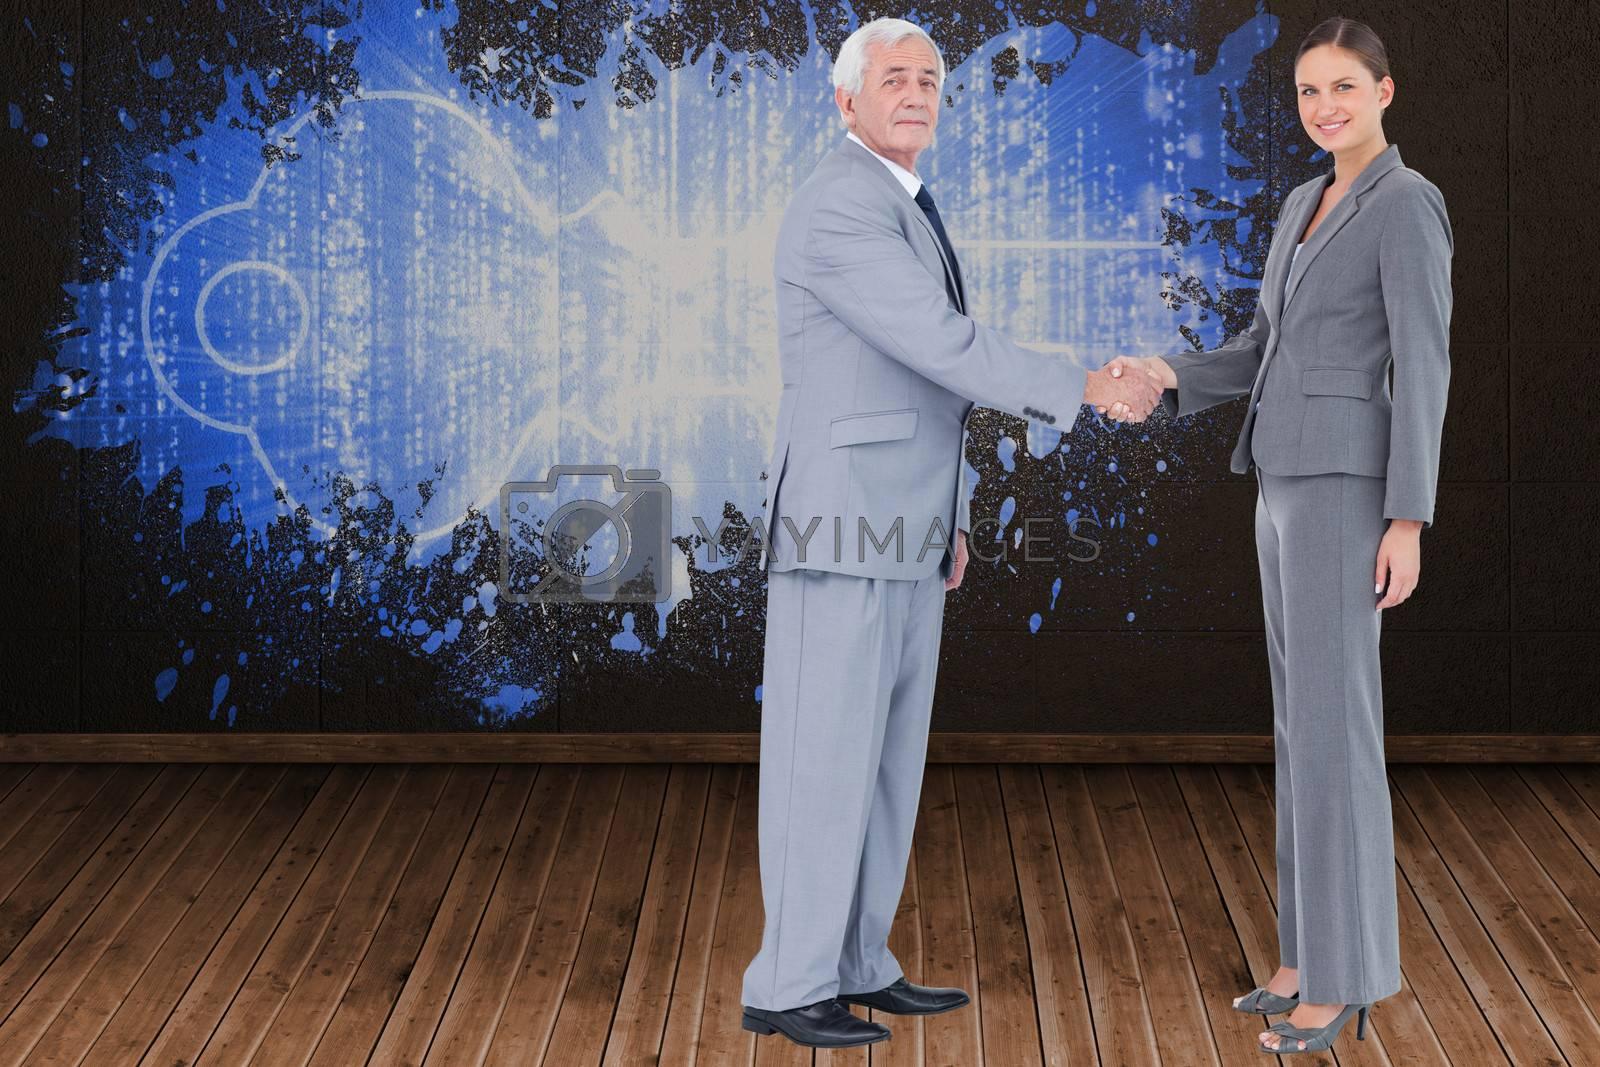 Businessman and woman shaking hands against splash on wall revealing digital key